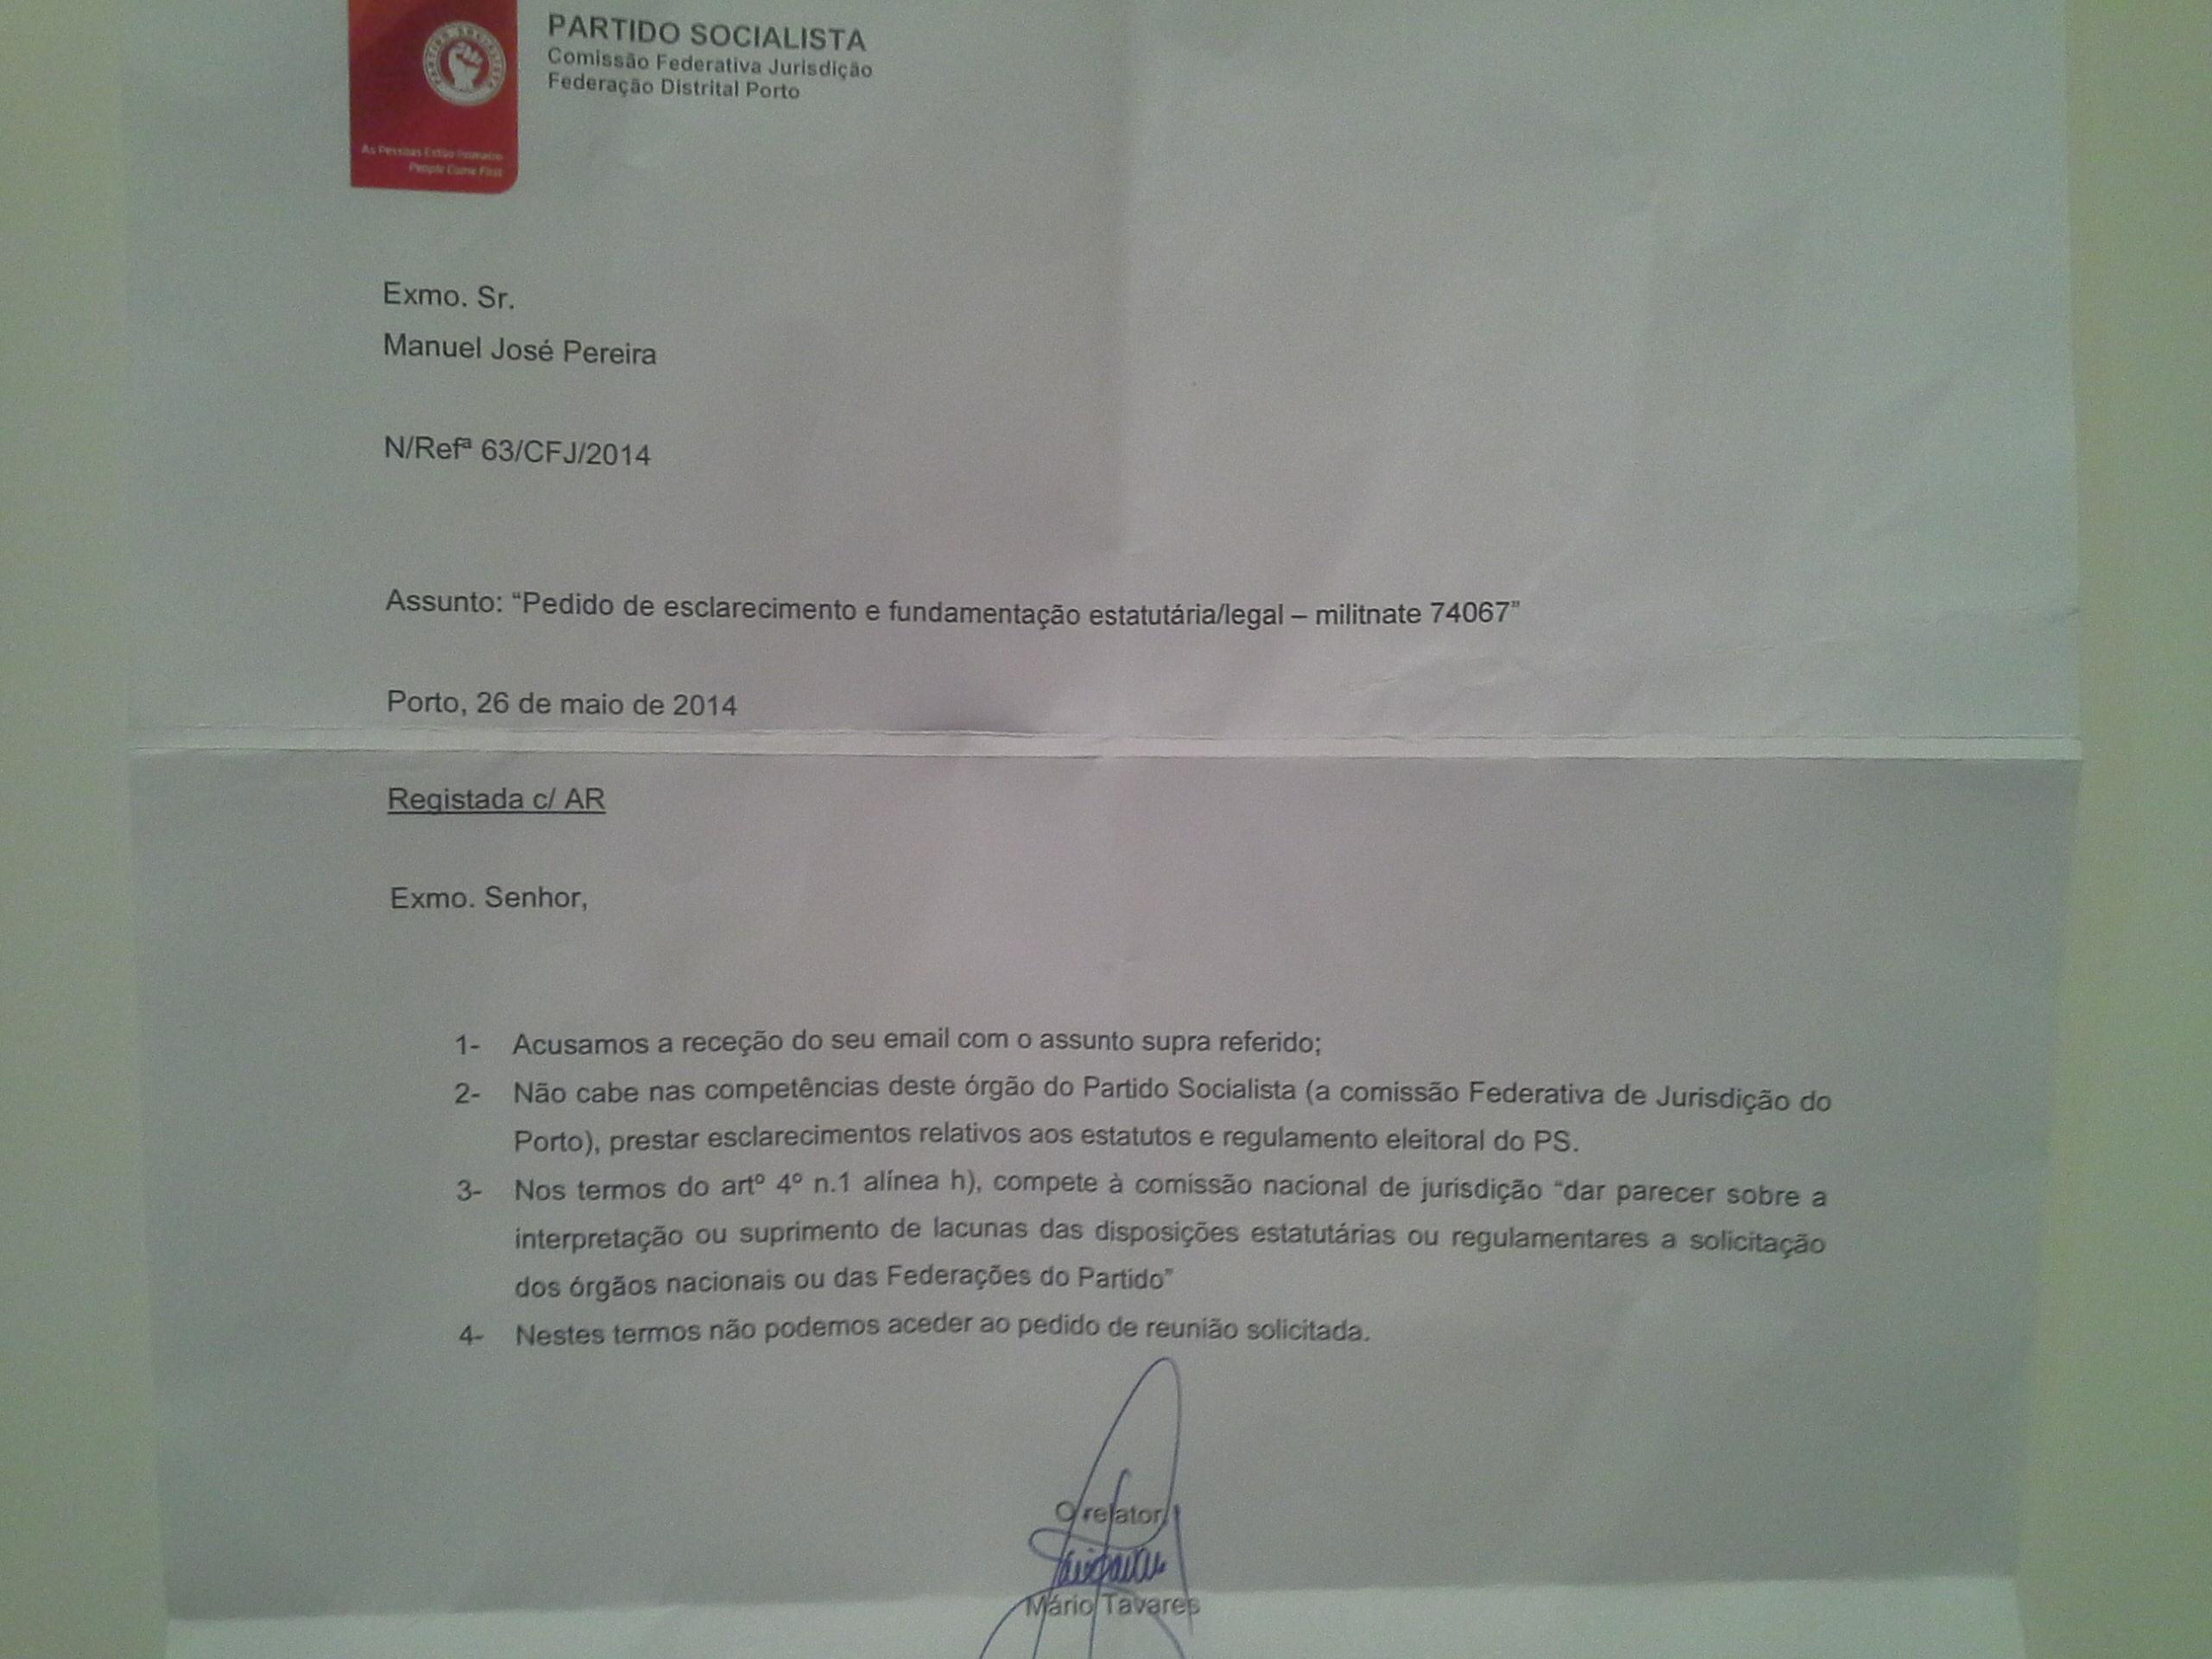 ps partido socialista eleições José Seguro e António Costa estatutos do ps